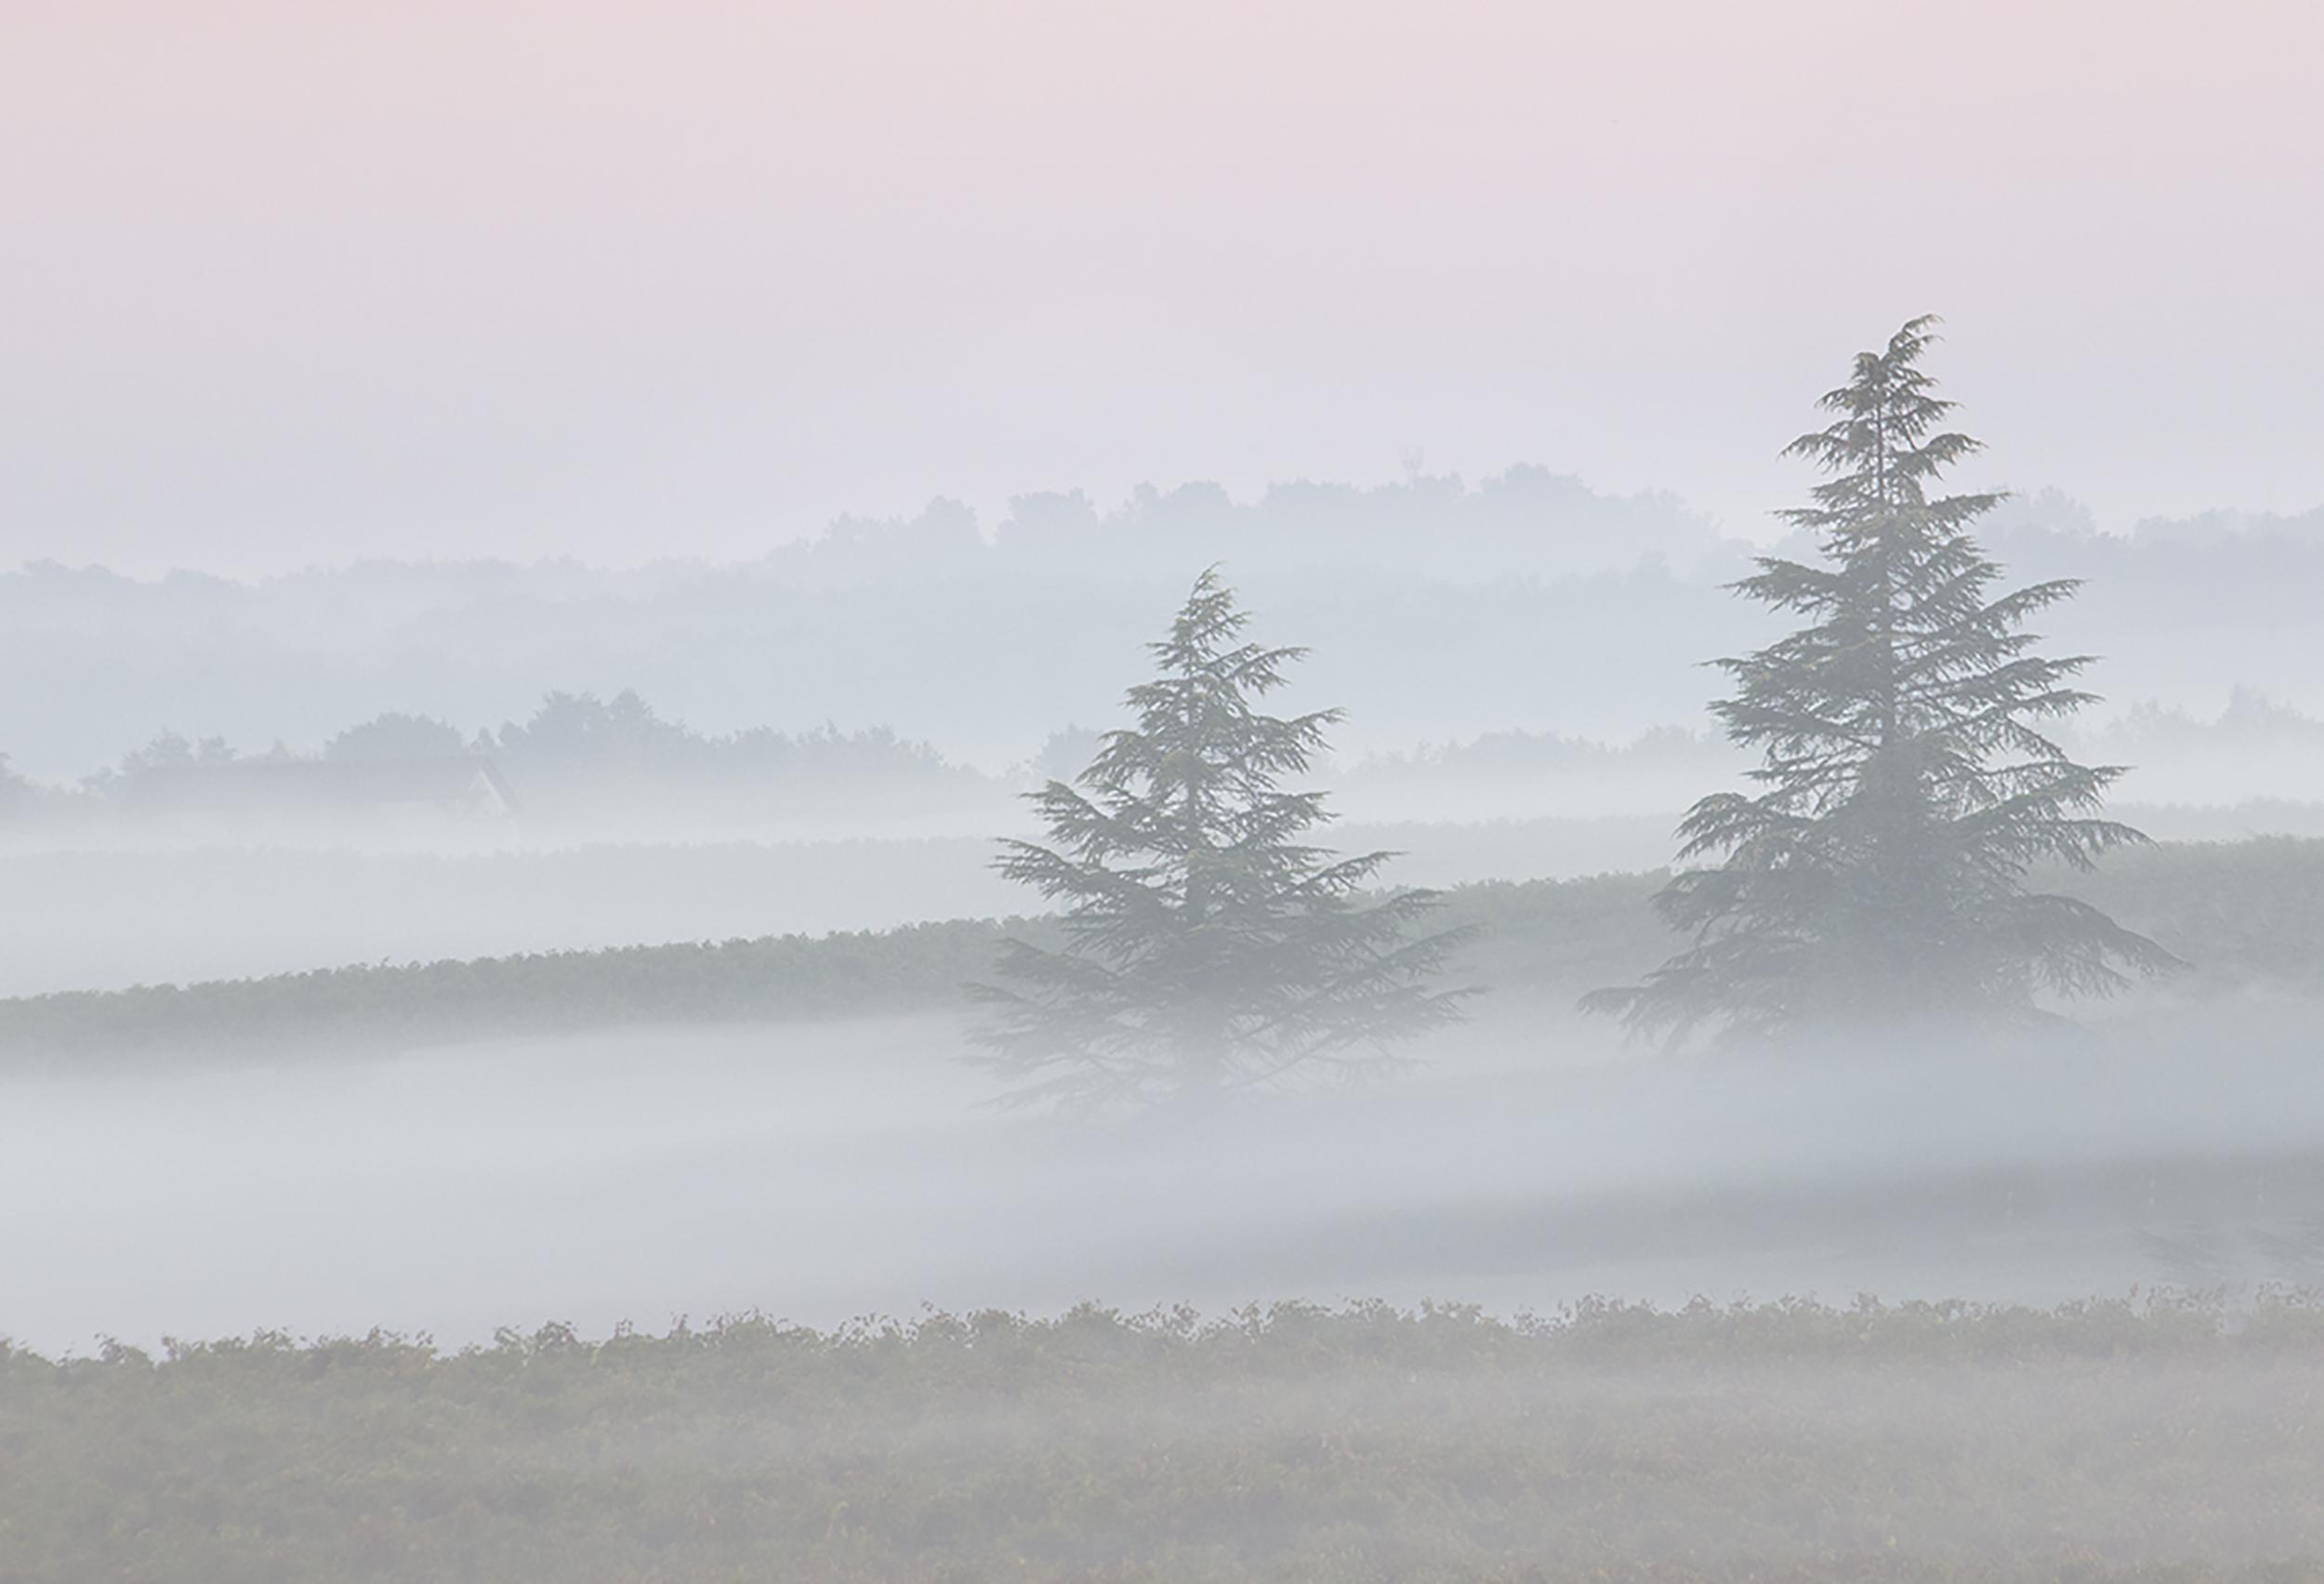 Two Trees in the Mist Landscape.jpg